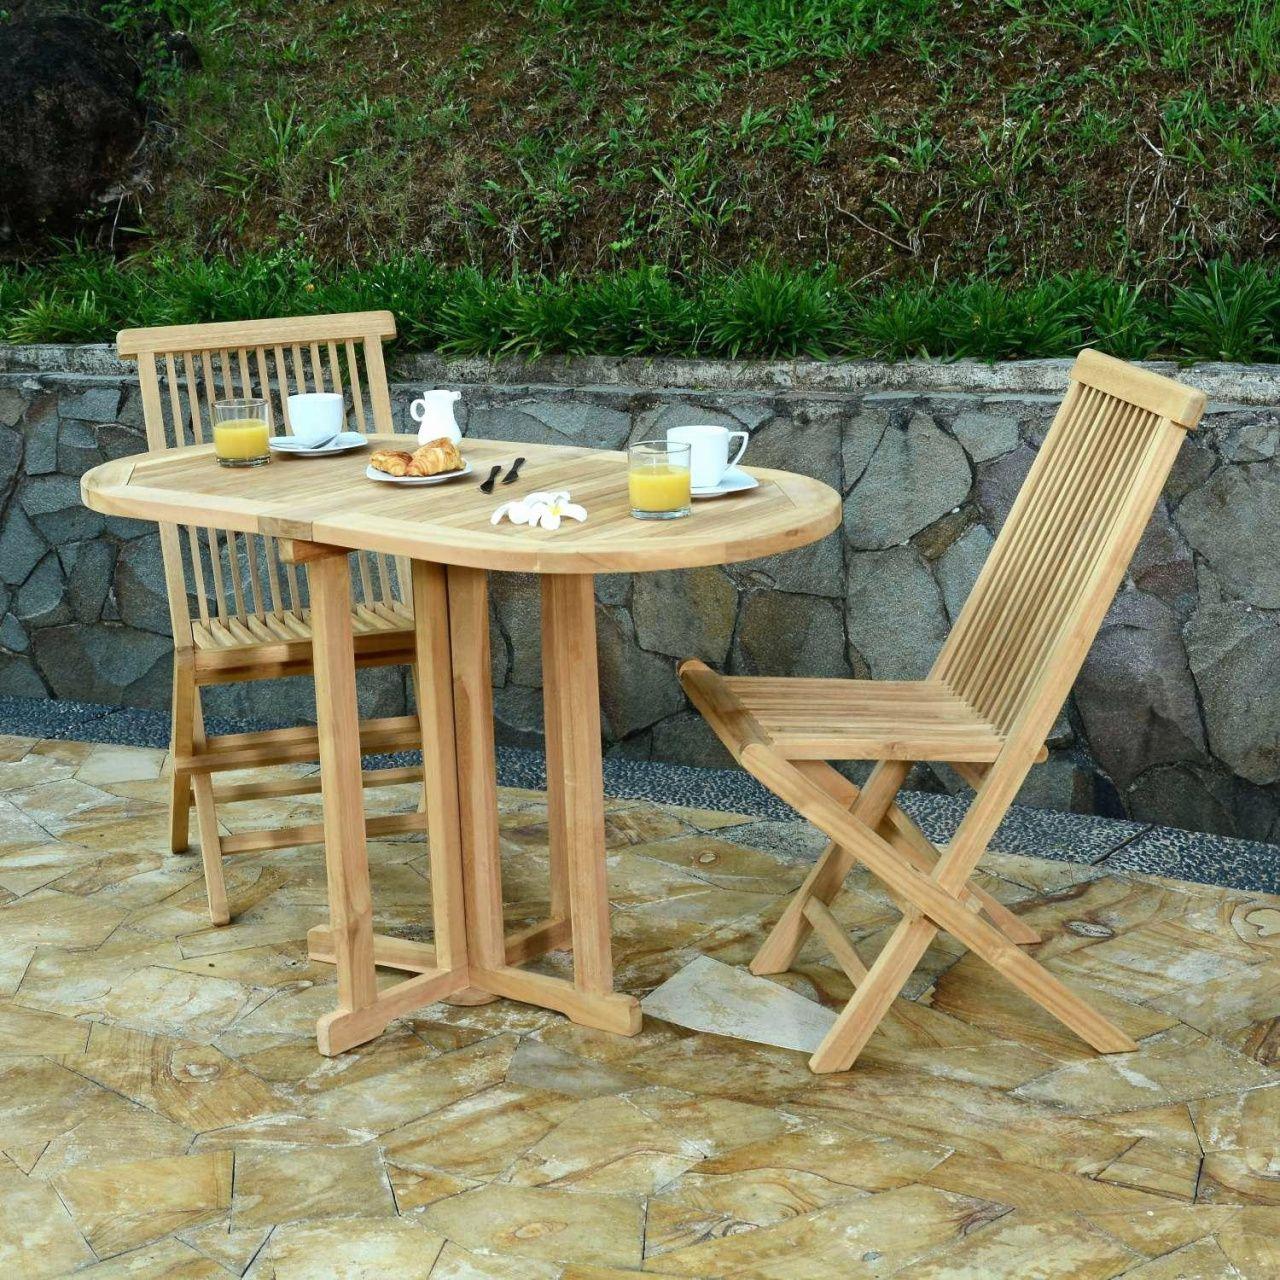 50 Centrakor Table De Jardin | Reupholster Furniture, Cool ... dedans Table De Jardin Centrakor